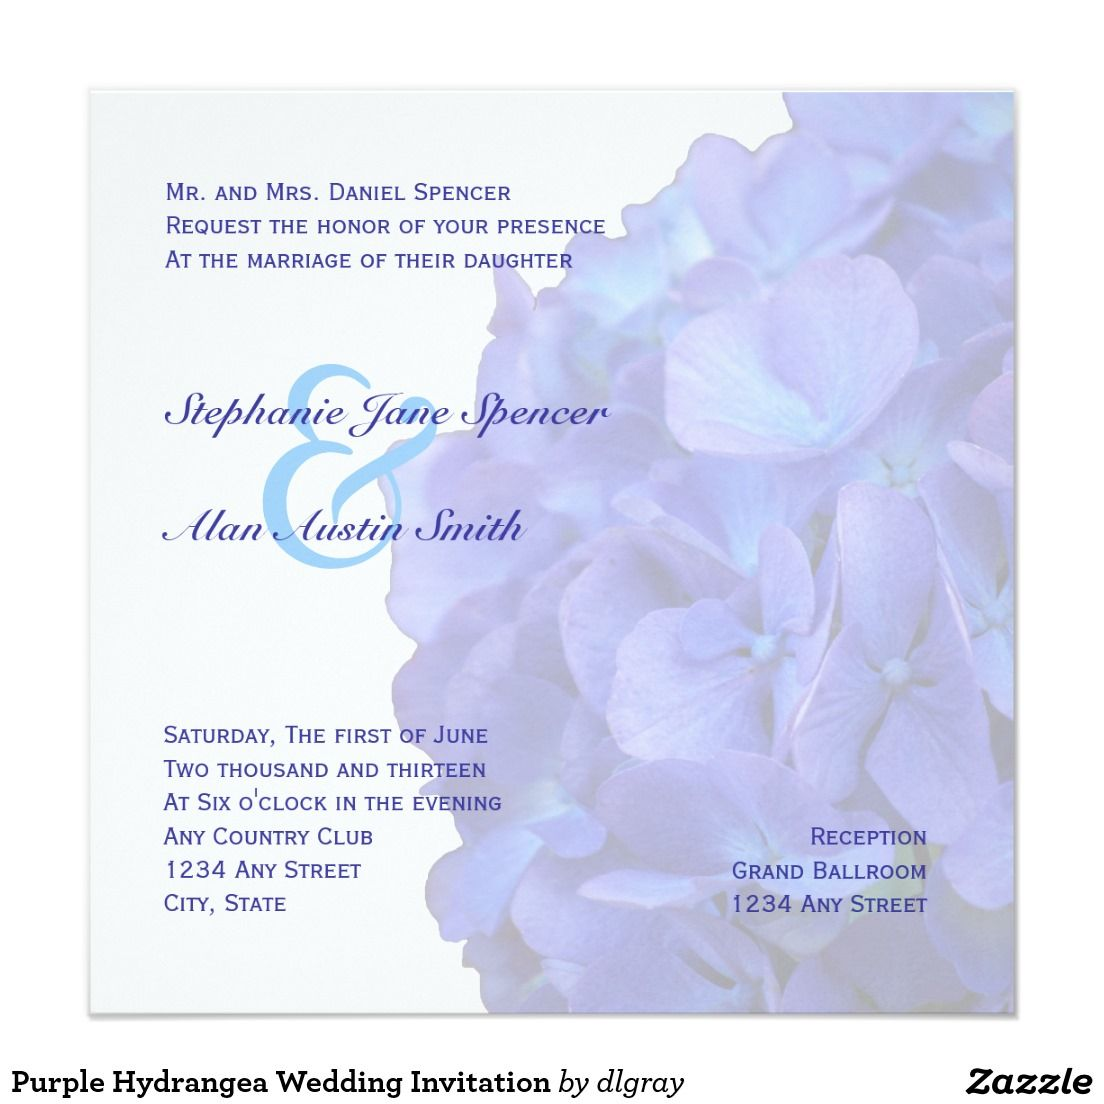 Purple hydrangea wedding invitation sample - Purple Hydrangea Wedding Invitation Sample 39